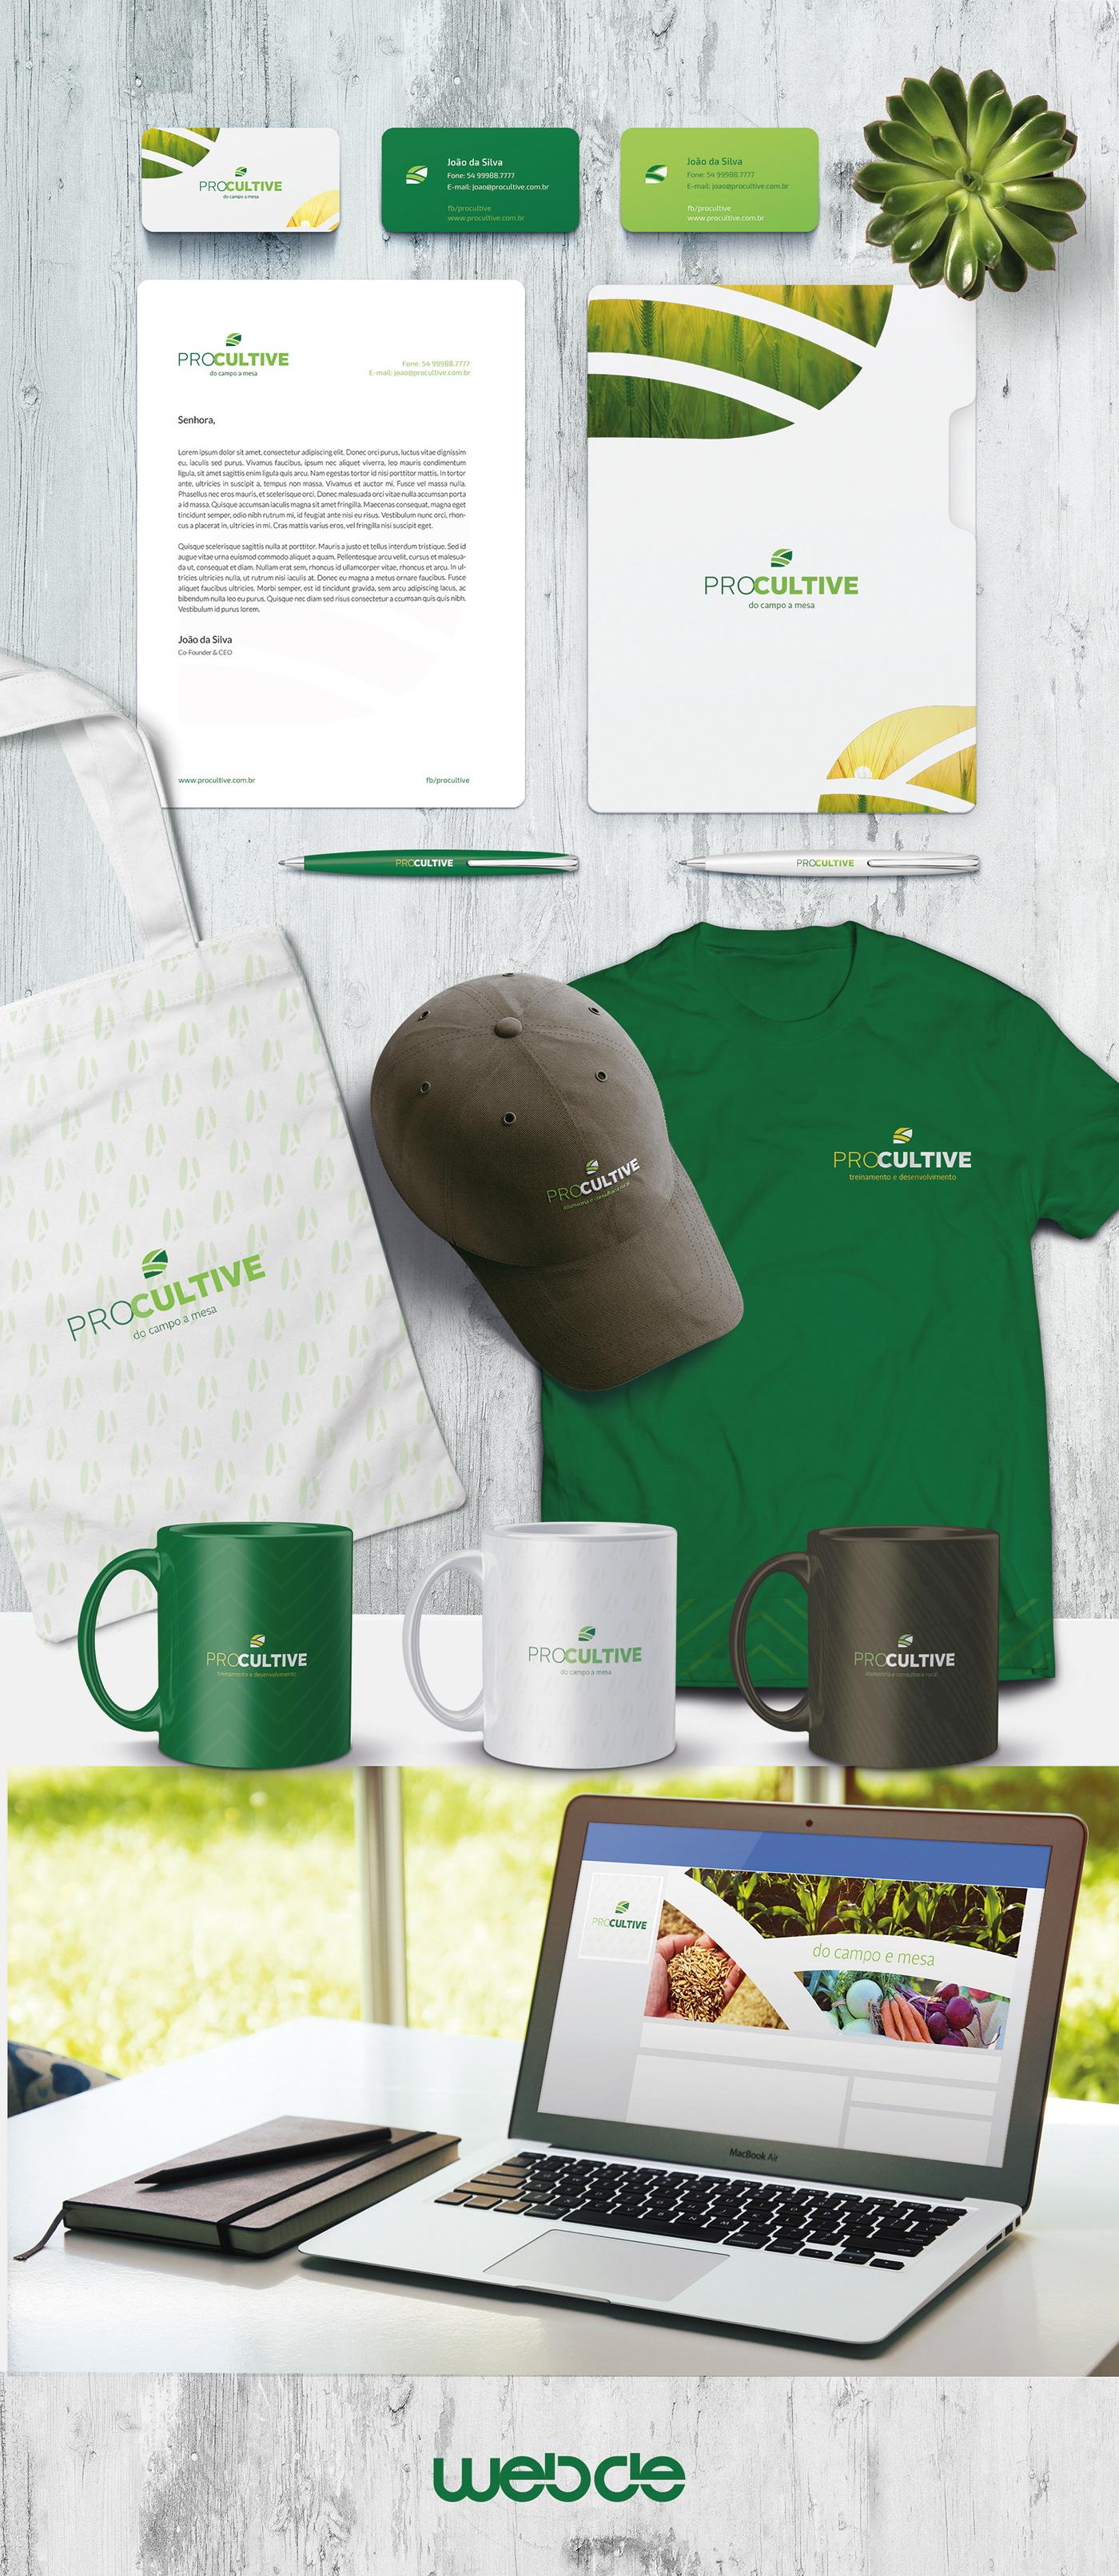 agricultura branding  design gráfico graphic design  green leaf logo marca agriculture business